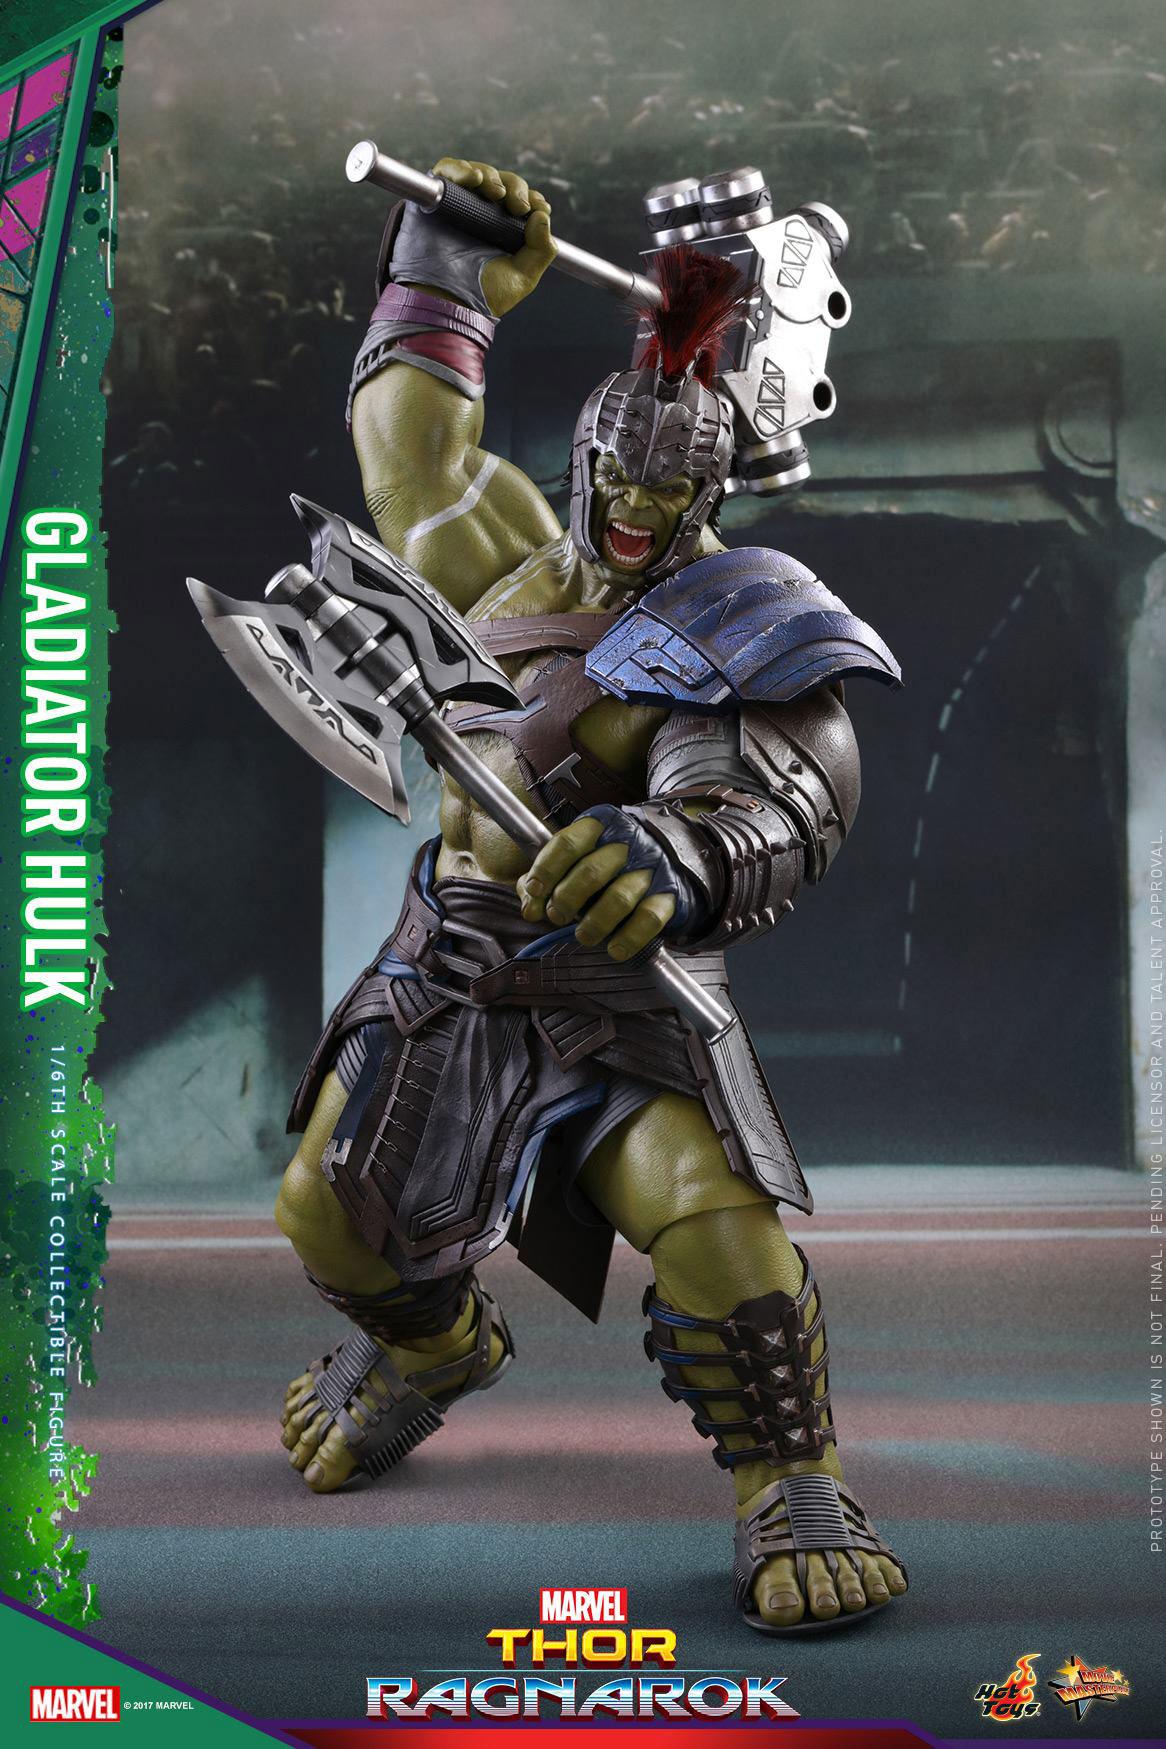 thor-ragnarok-gladiator-hulk-hot-toys-figure-7